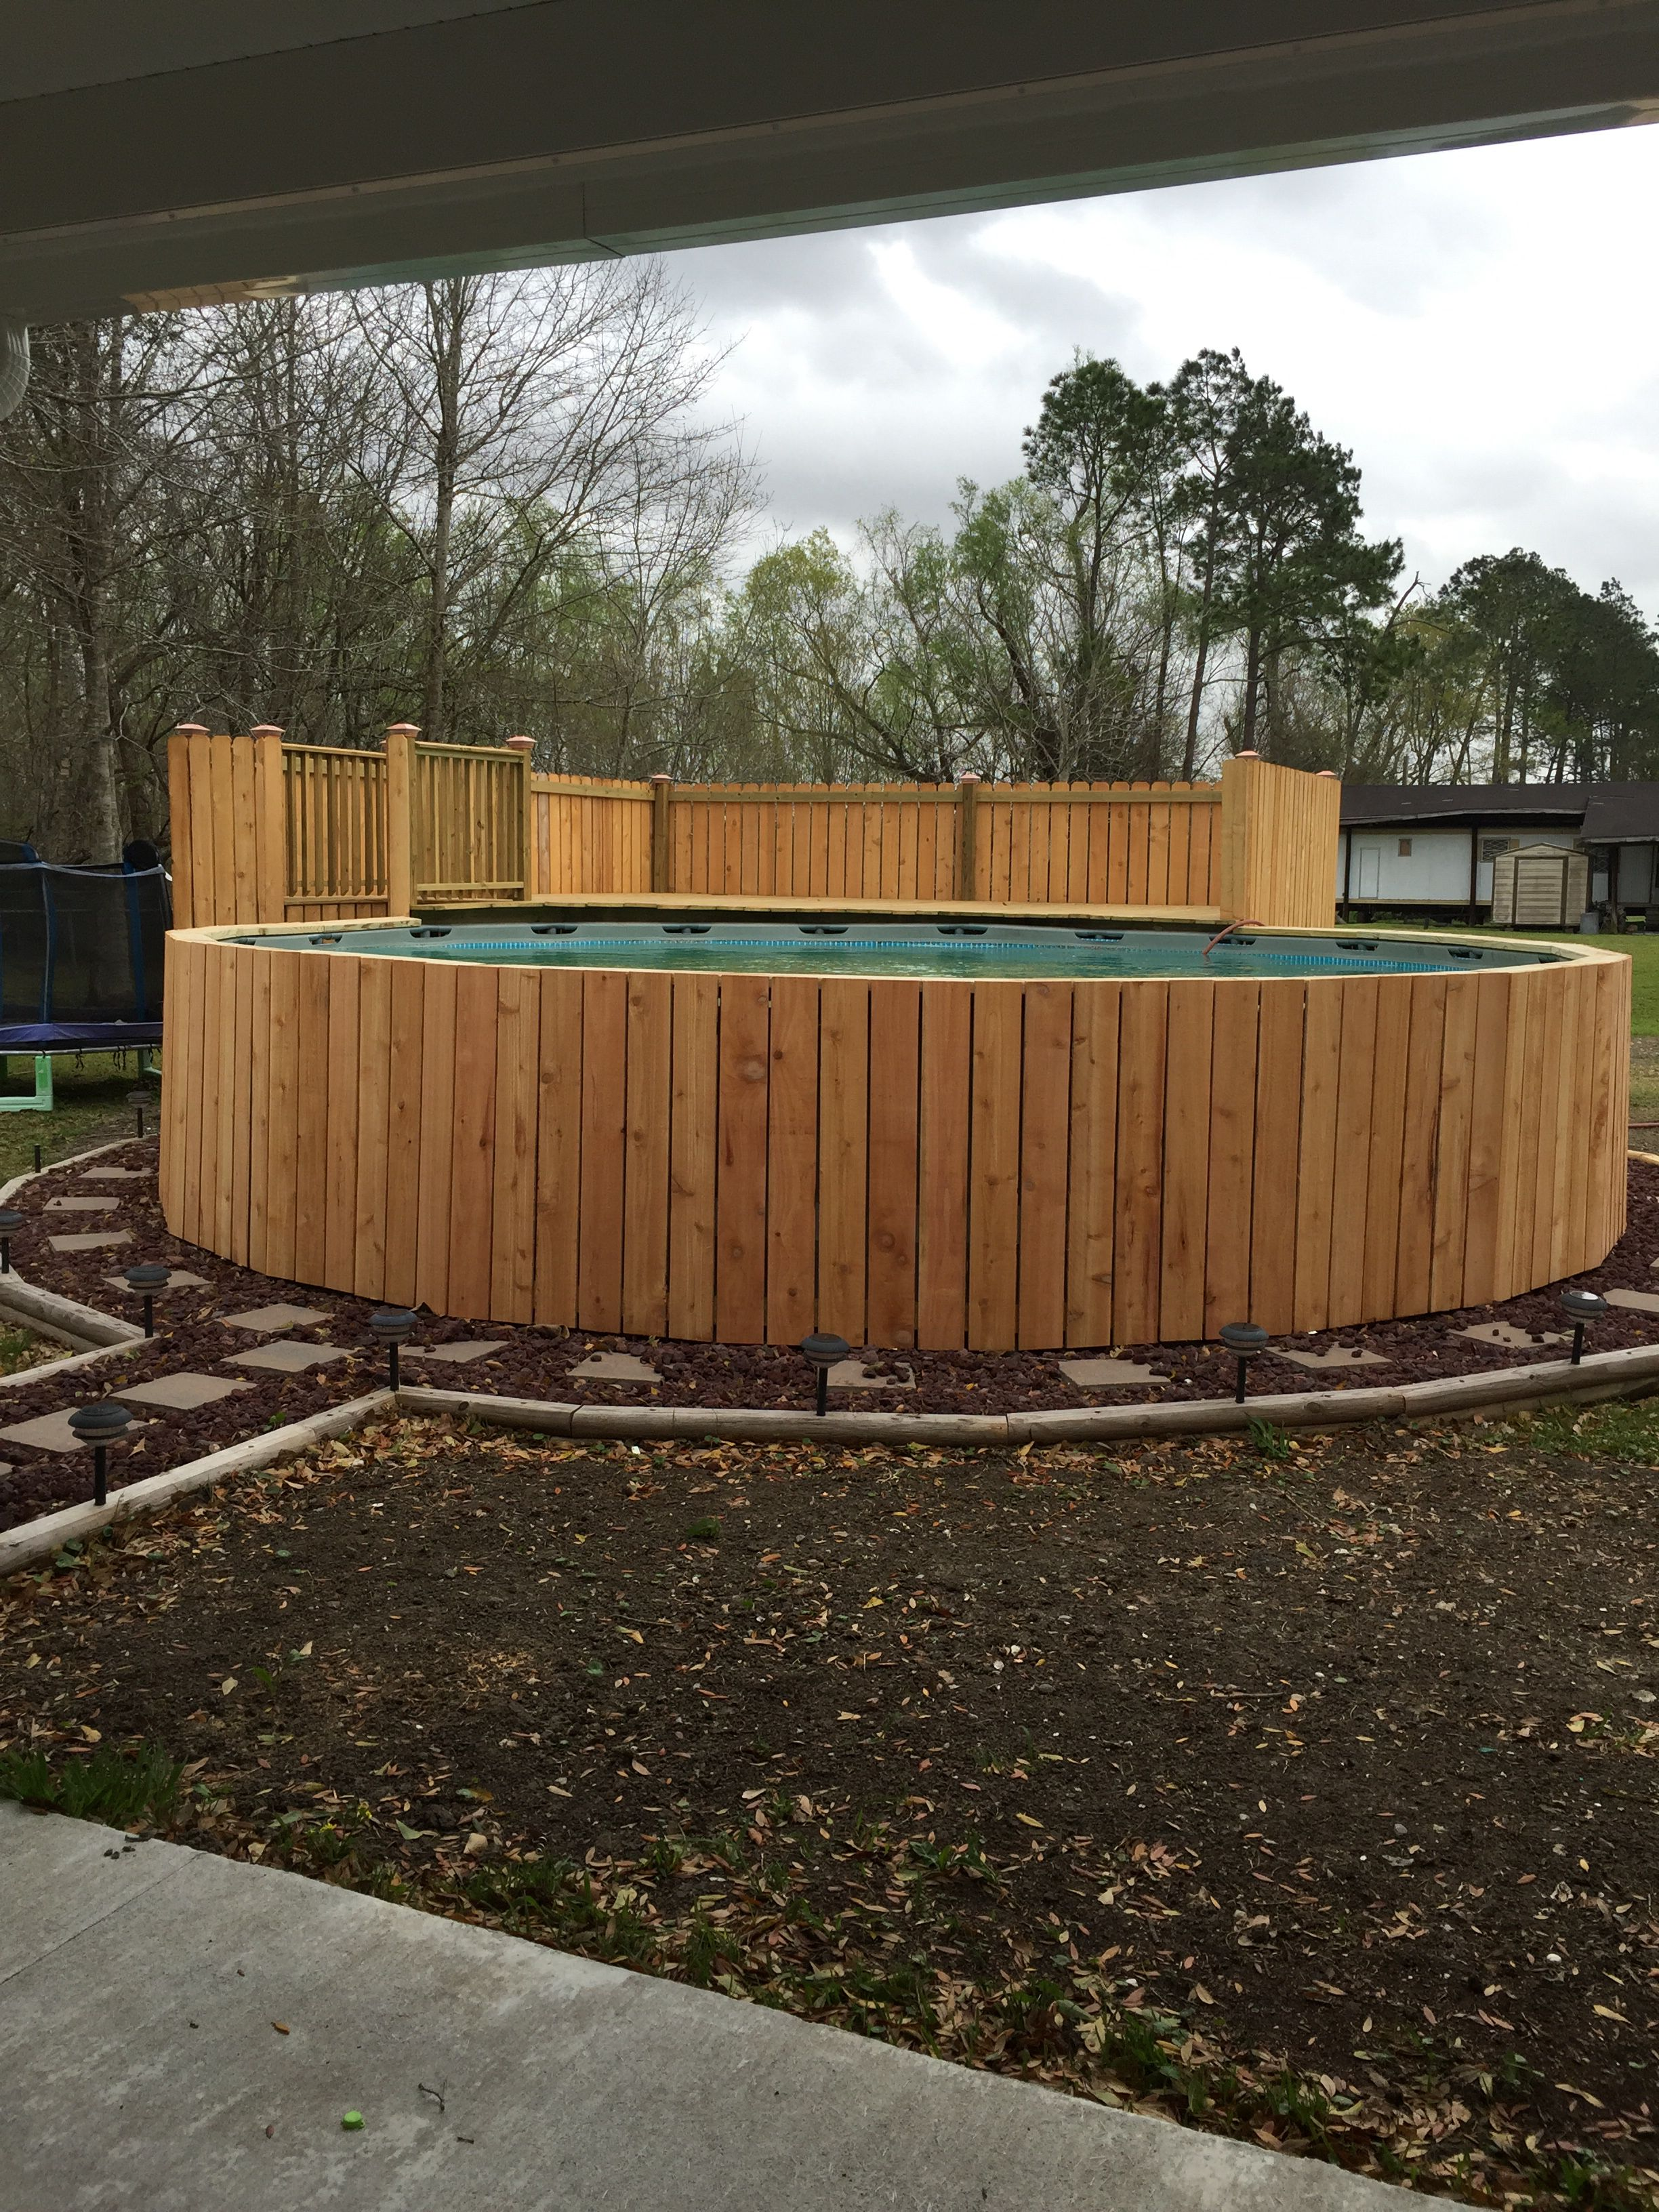 Fencing walmart pool with half deck pool ideas for Above ground pool decks walmart